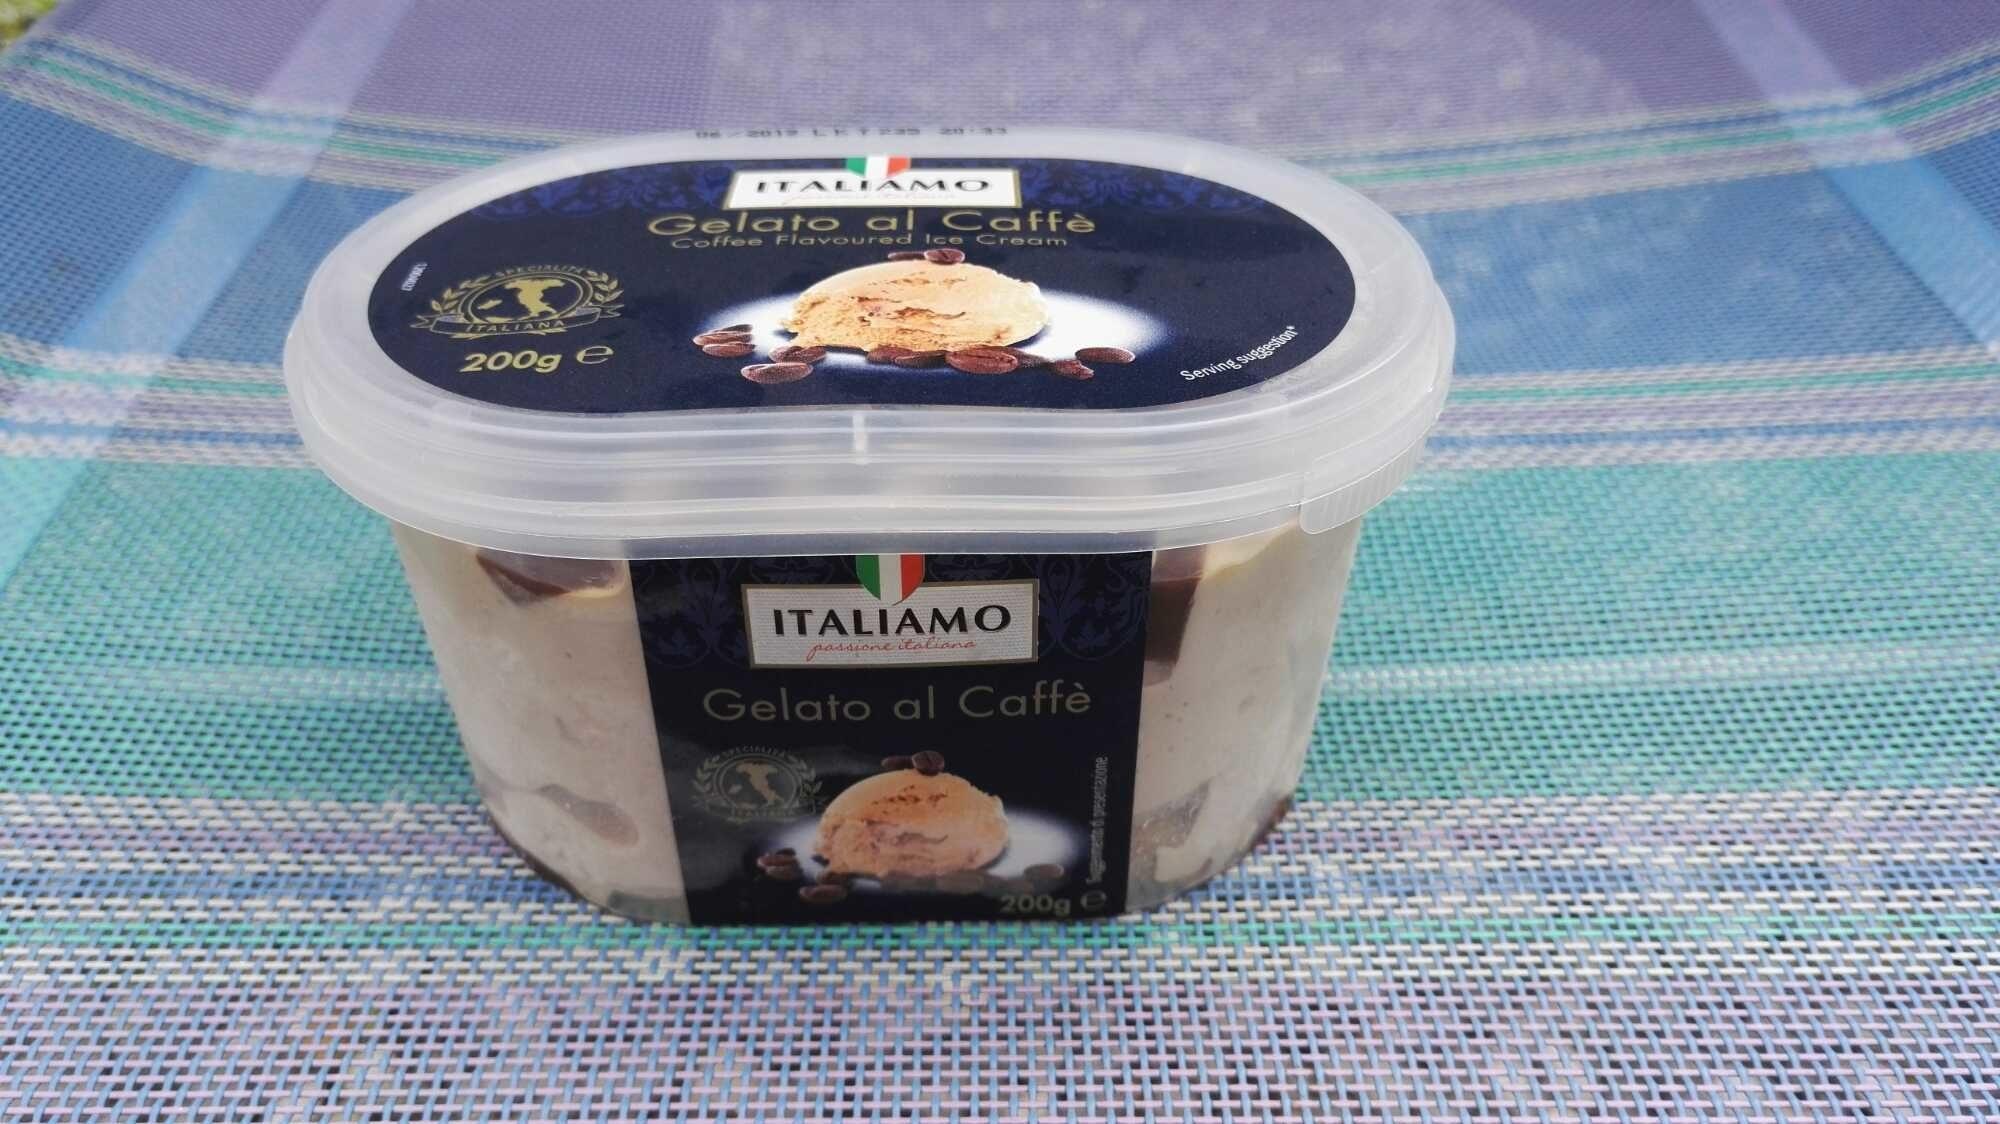 Gelato Al Caffe, Kaffee - Product